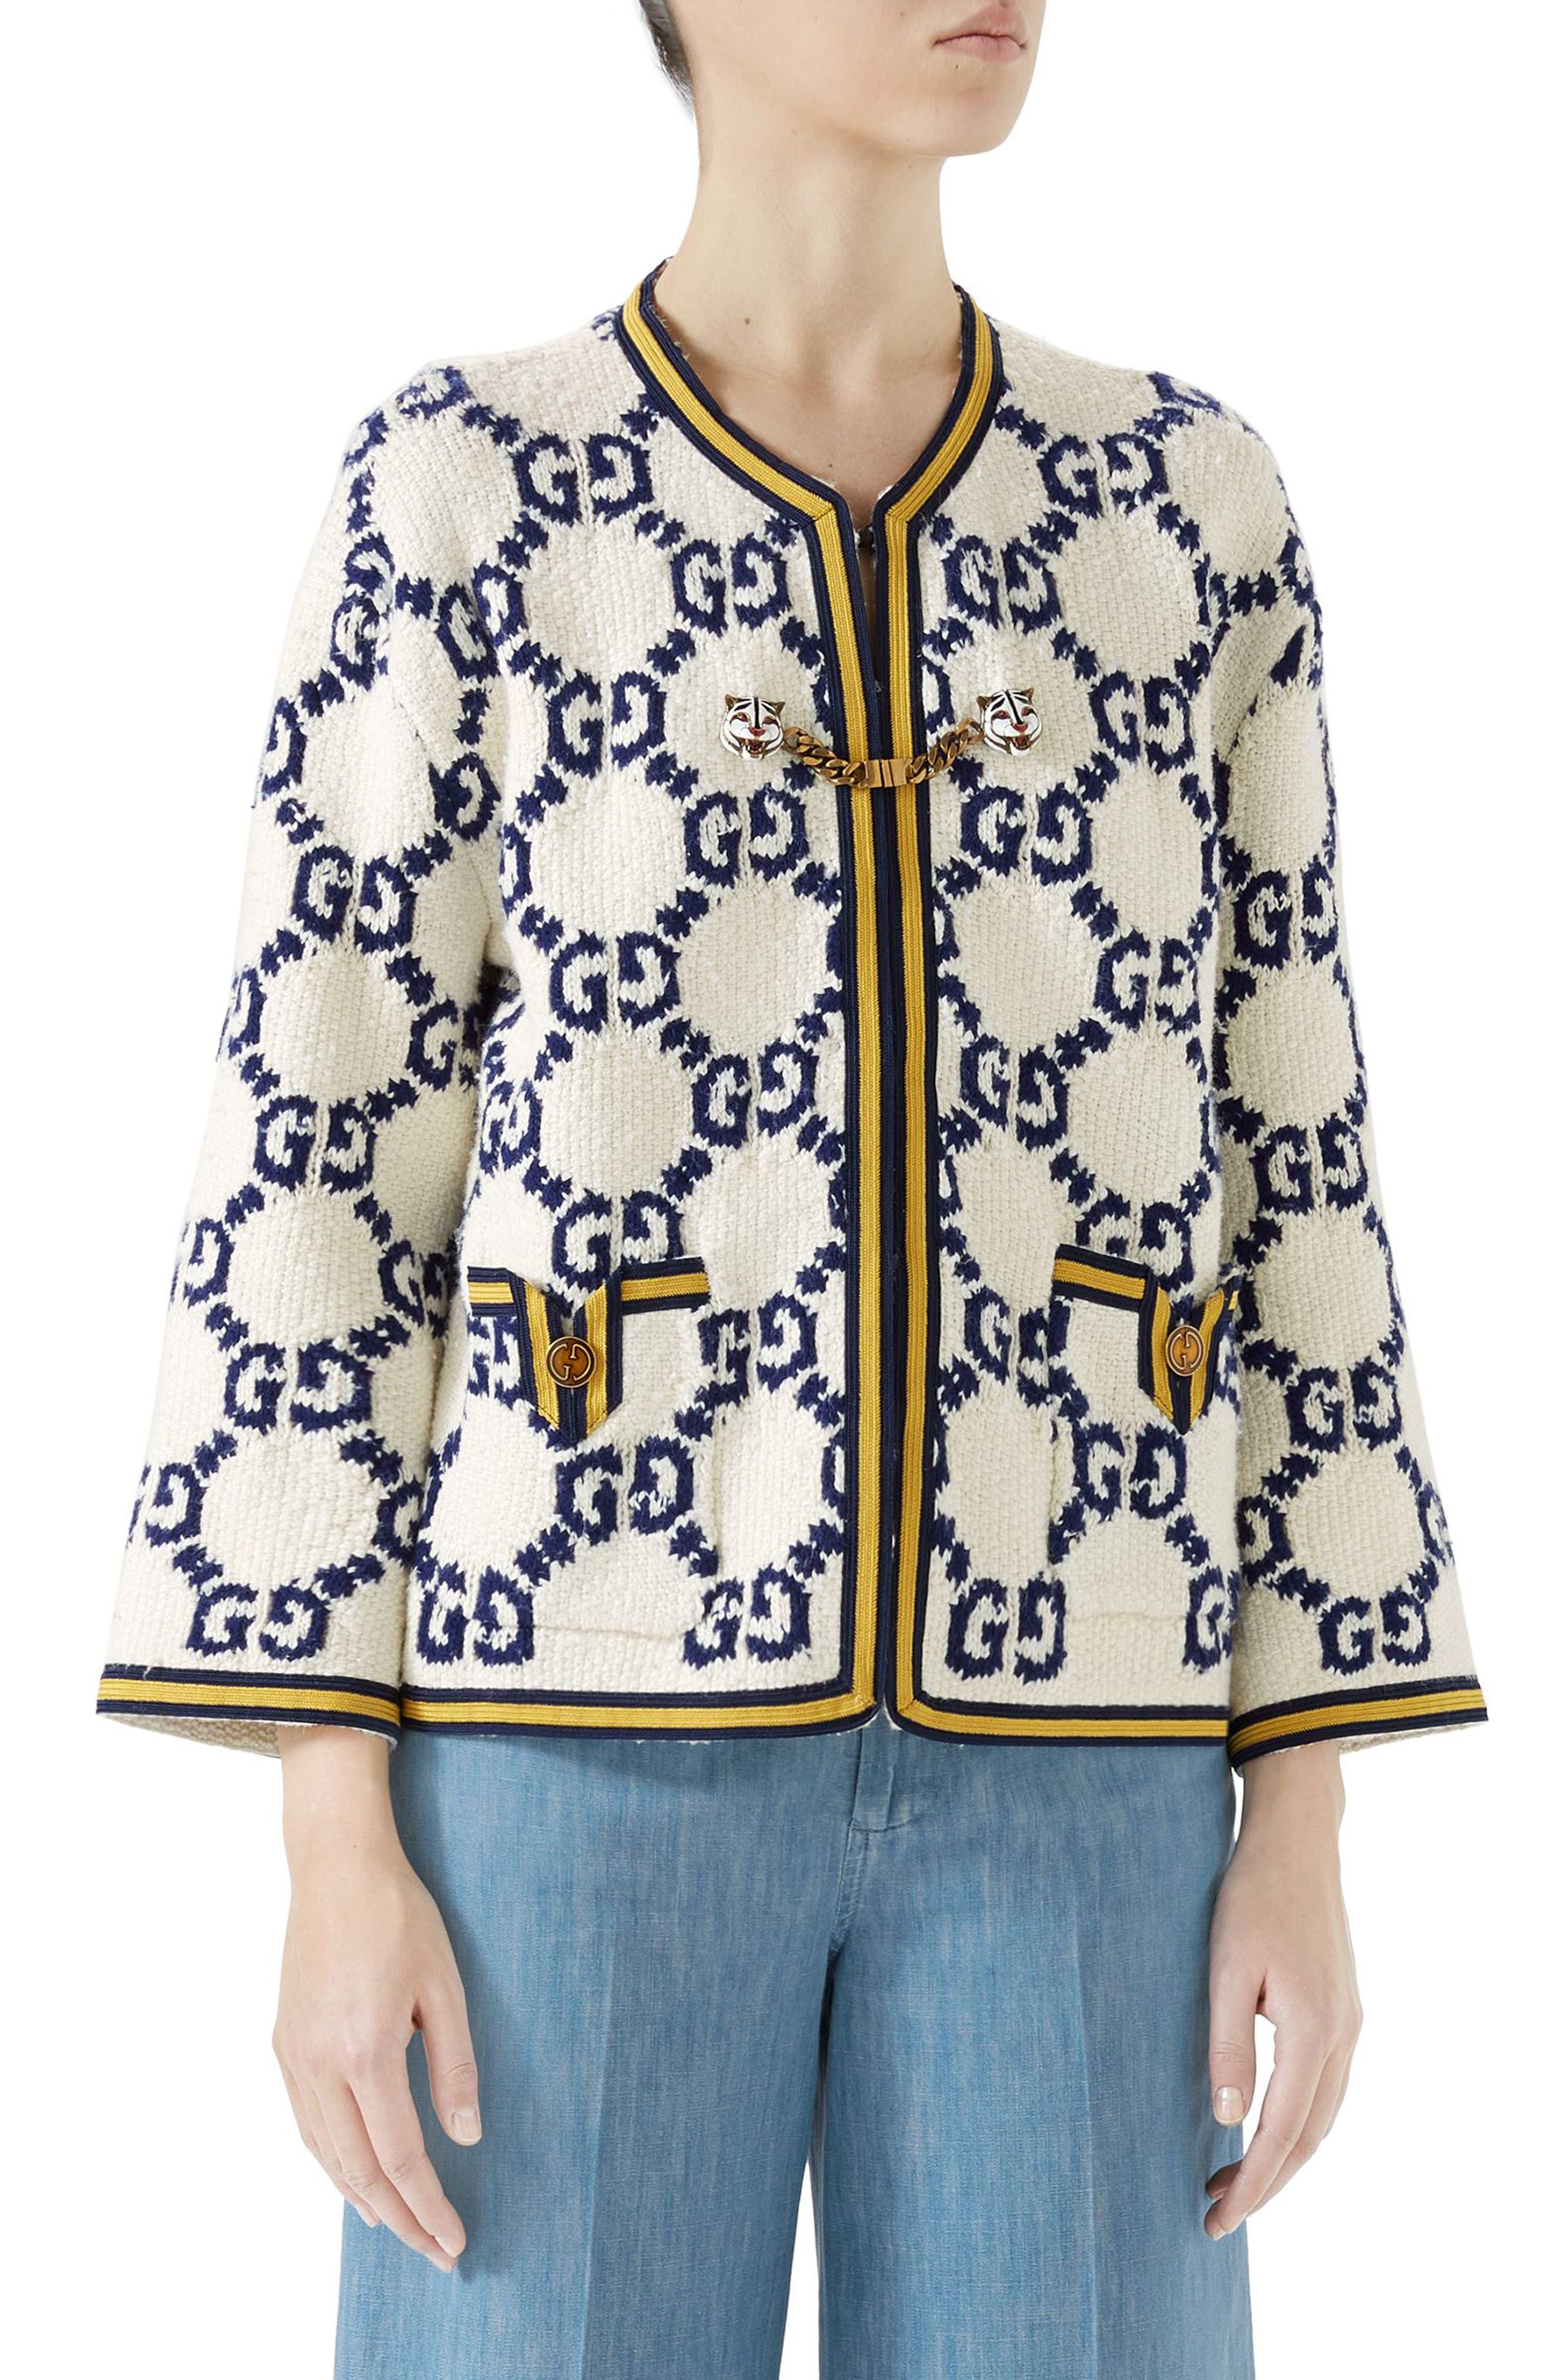 GG Textured Silk, Wool & Linen Tweed Jacket,                         Main,                         color, Multi